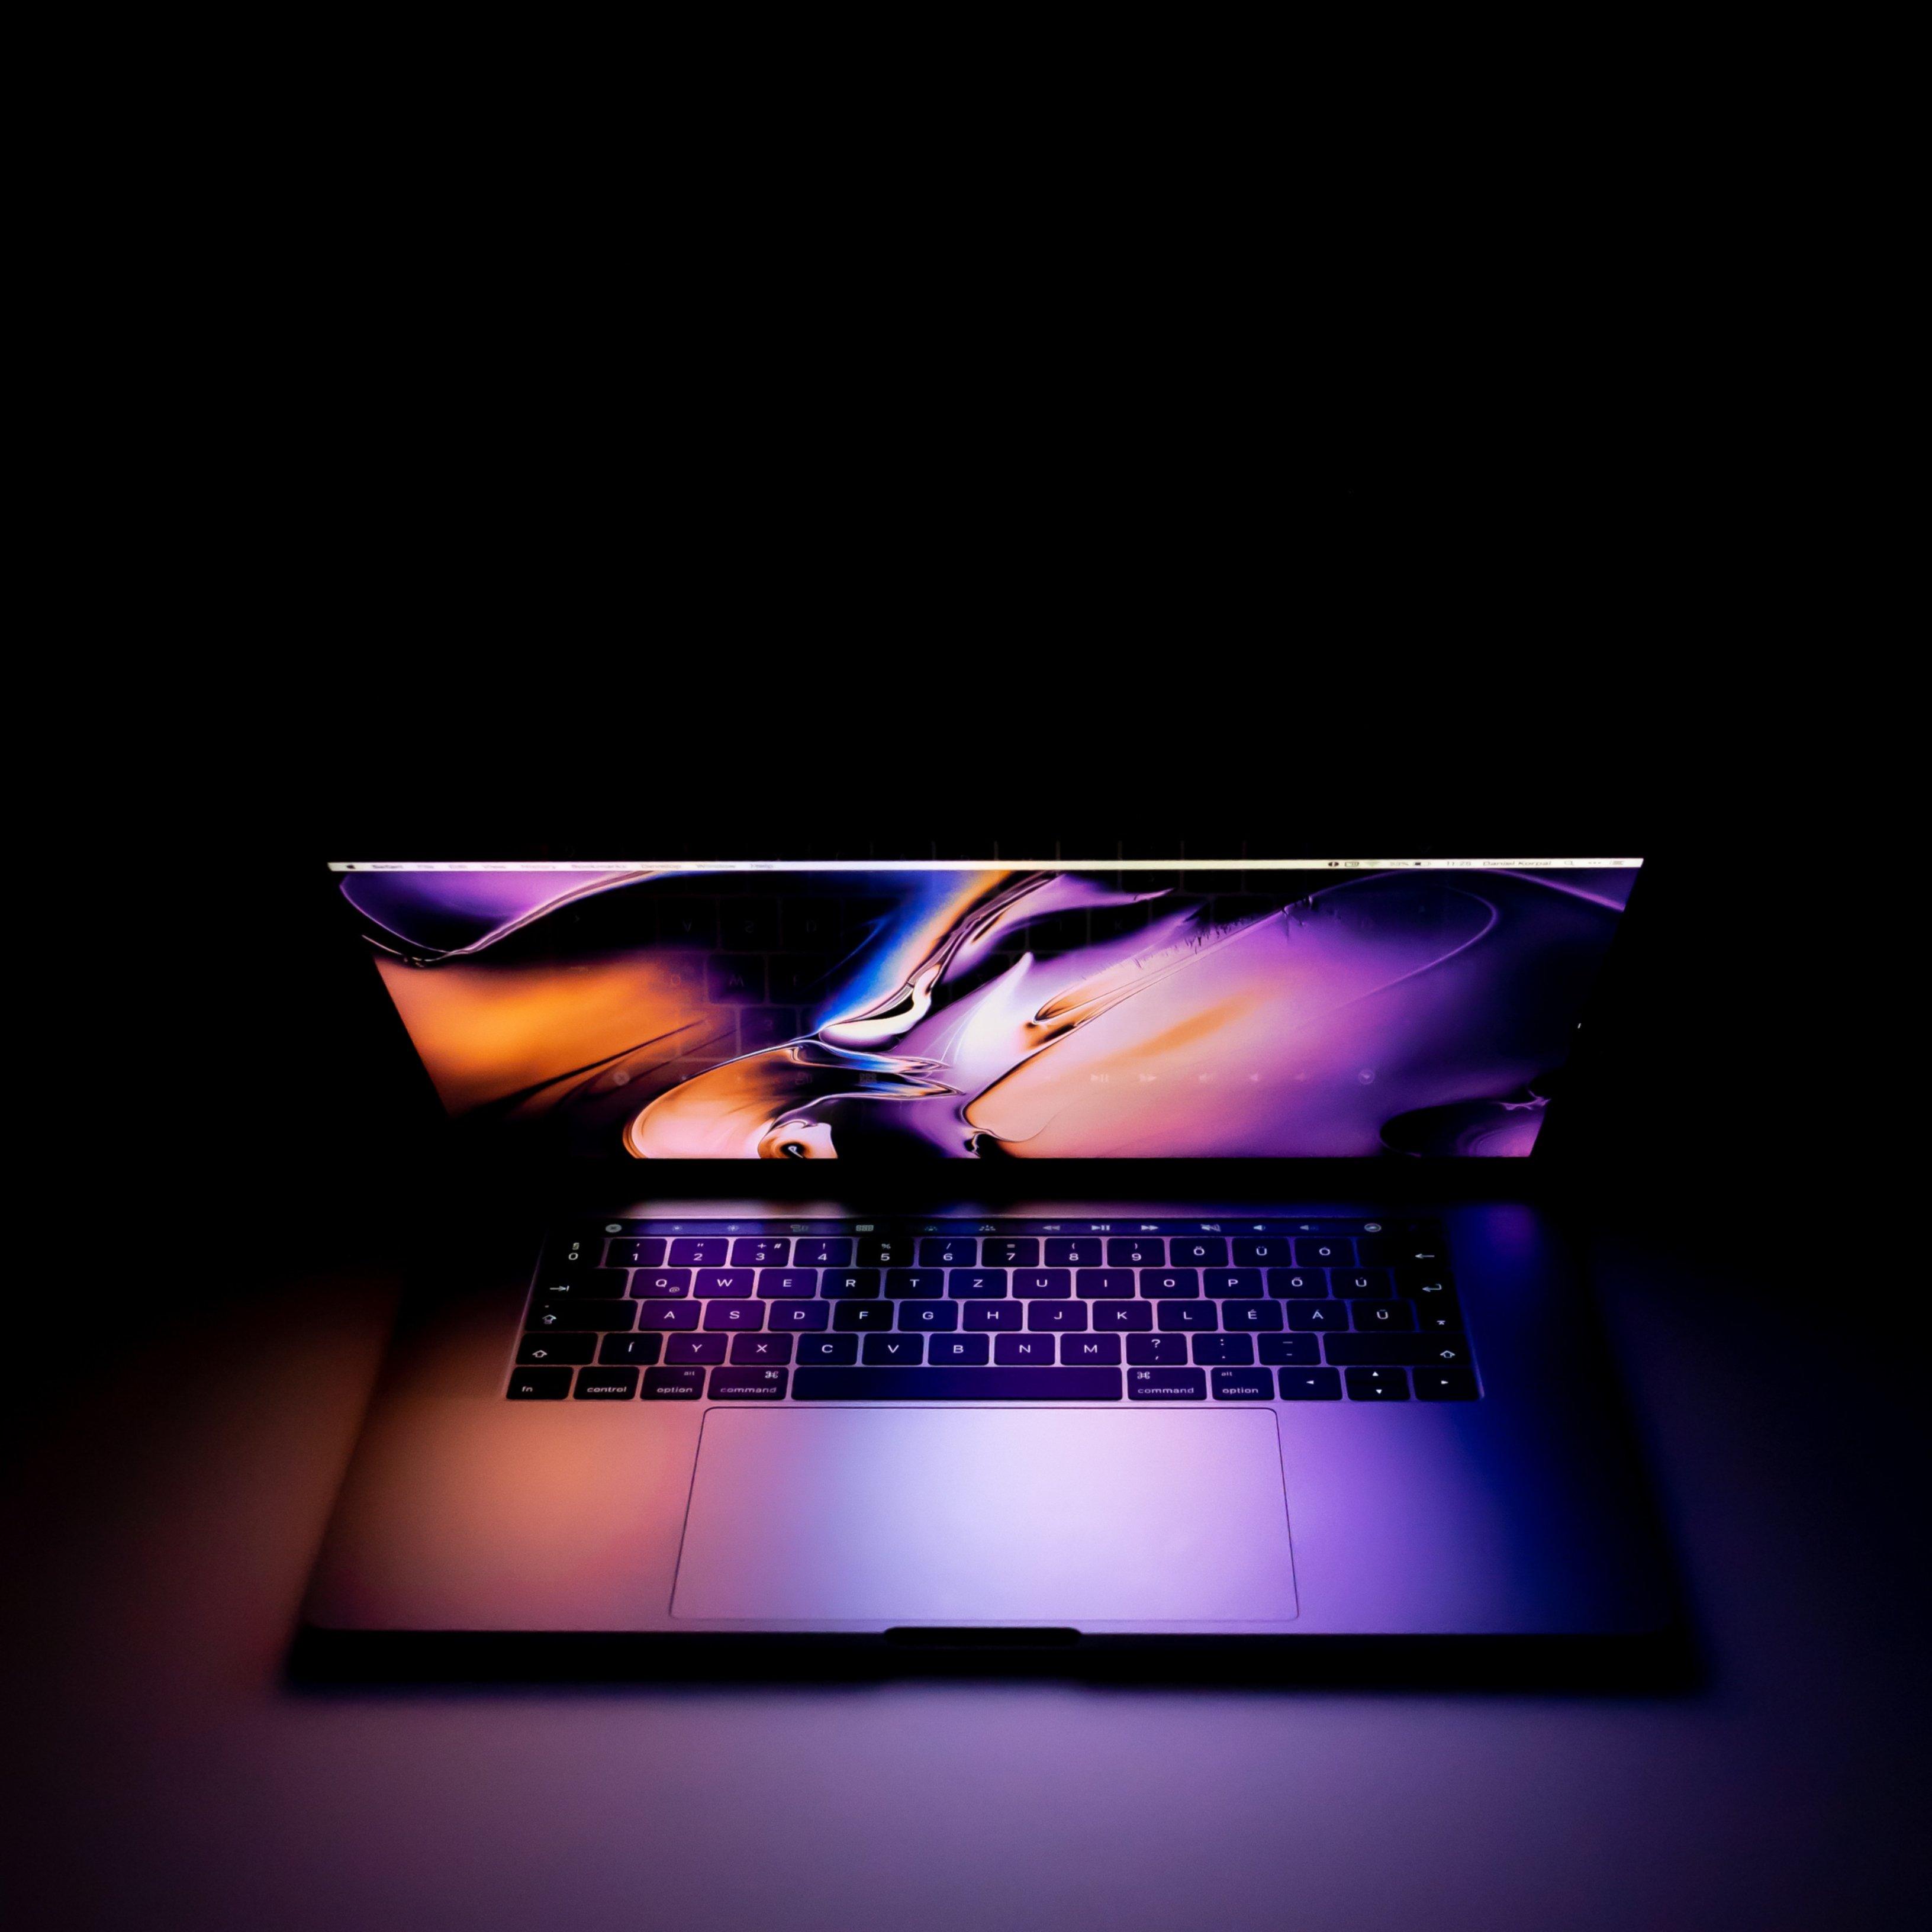 Borrar ordenador Unsplash